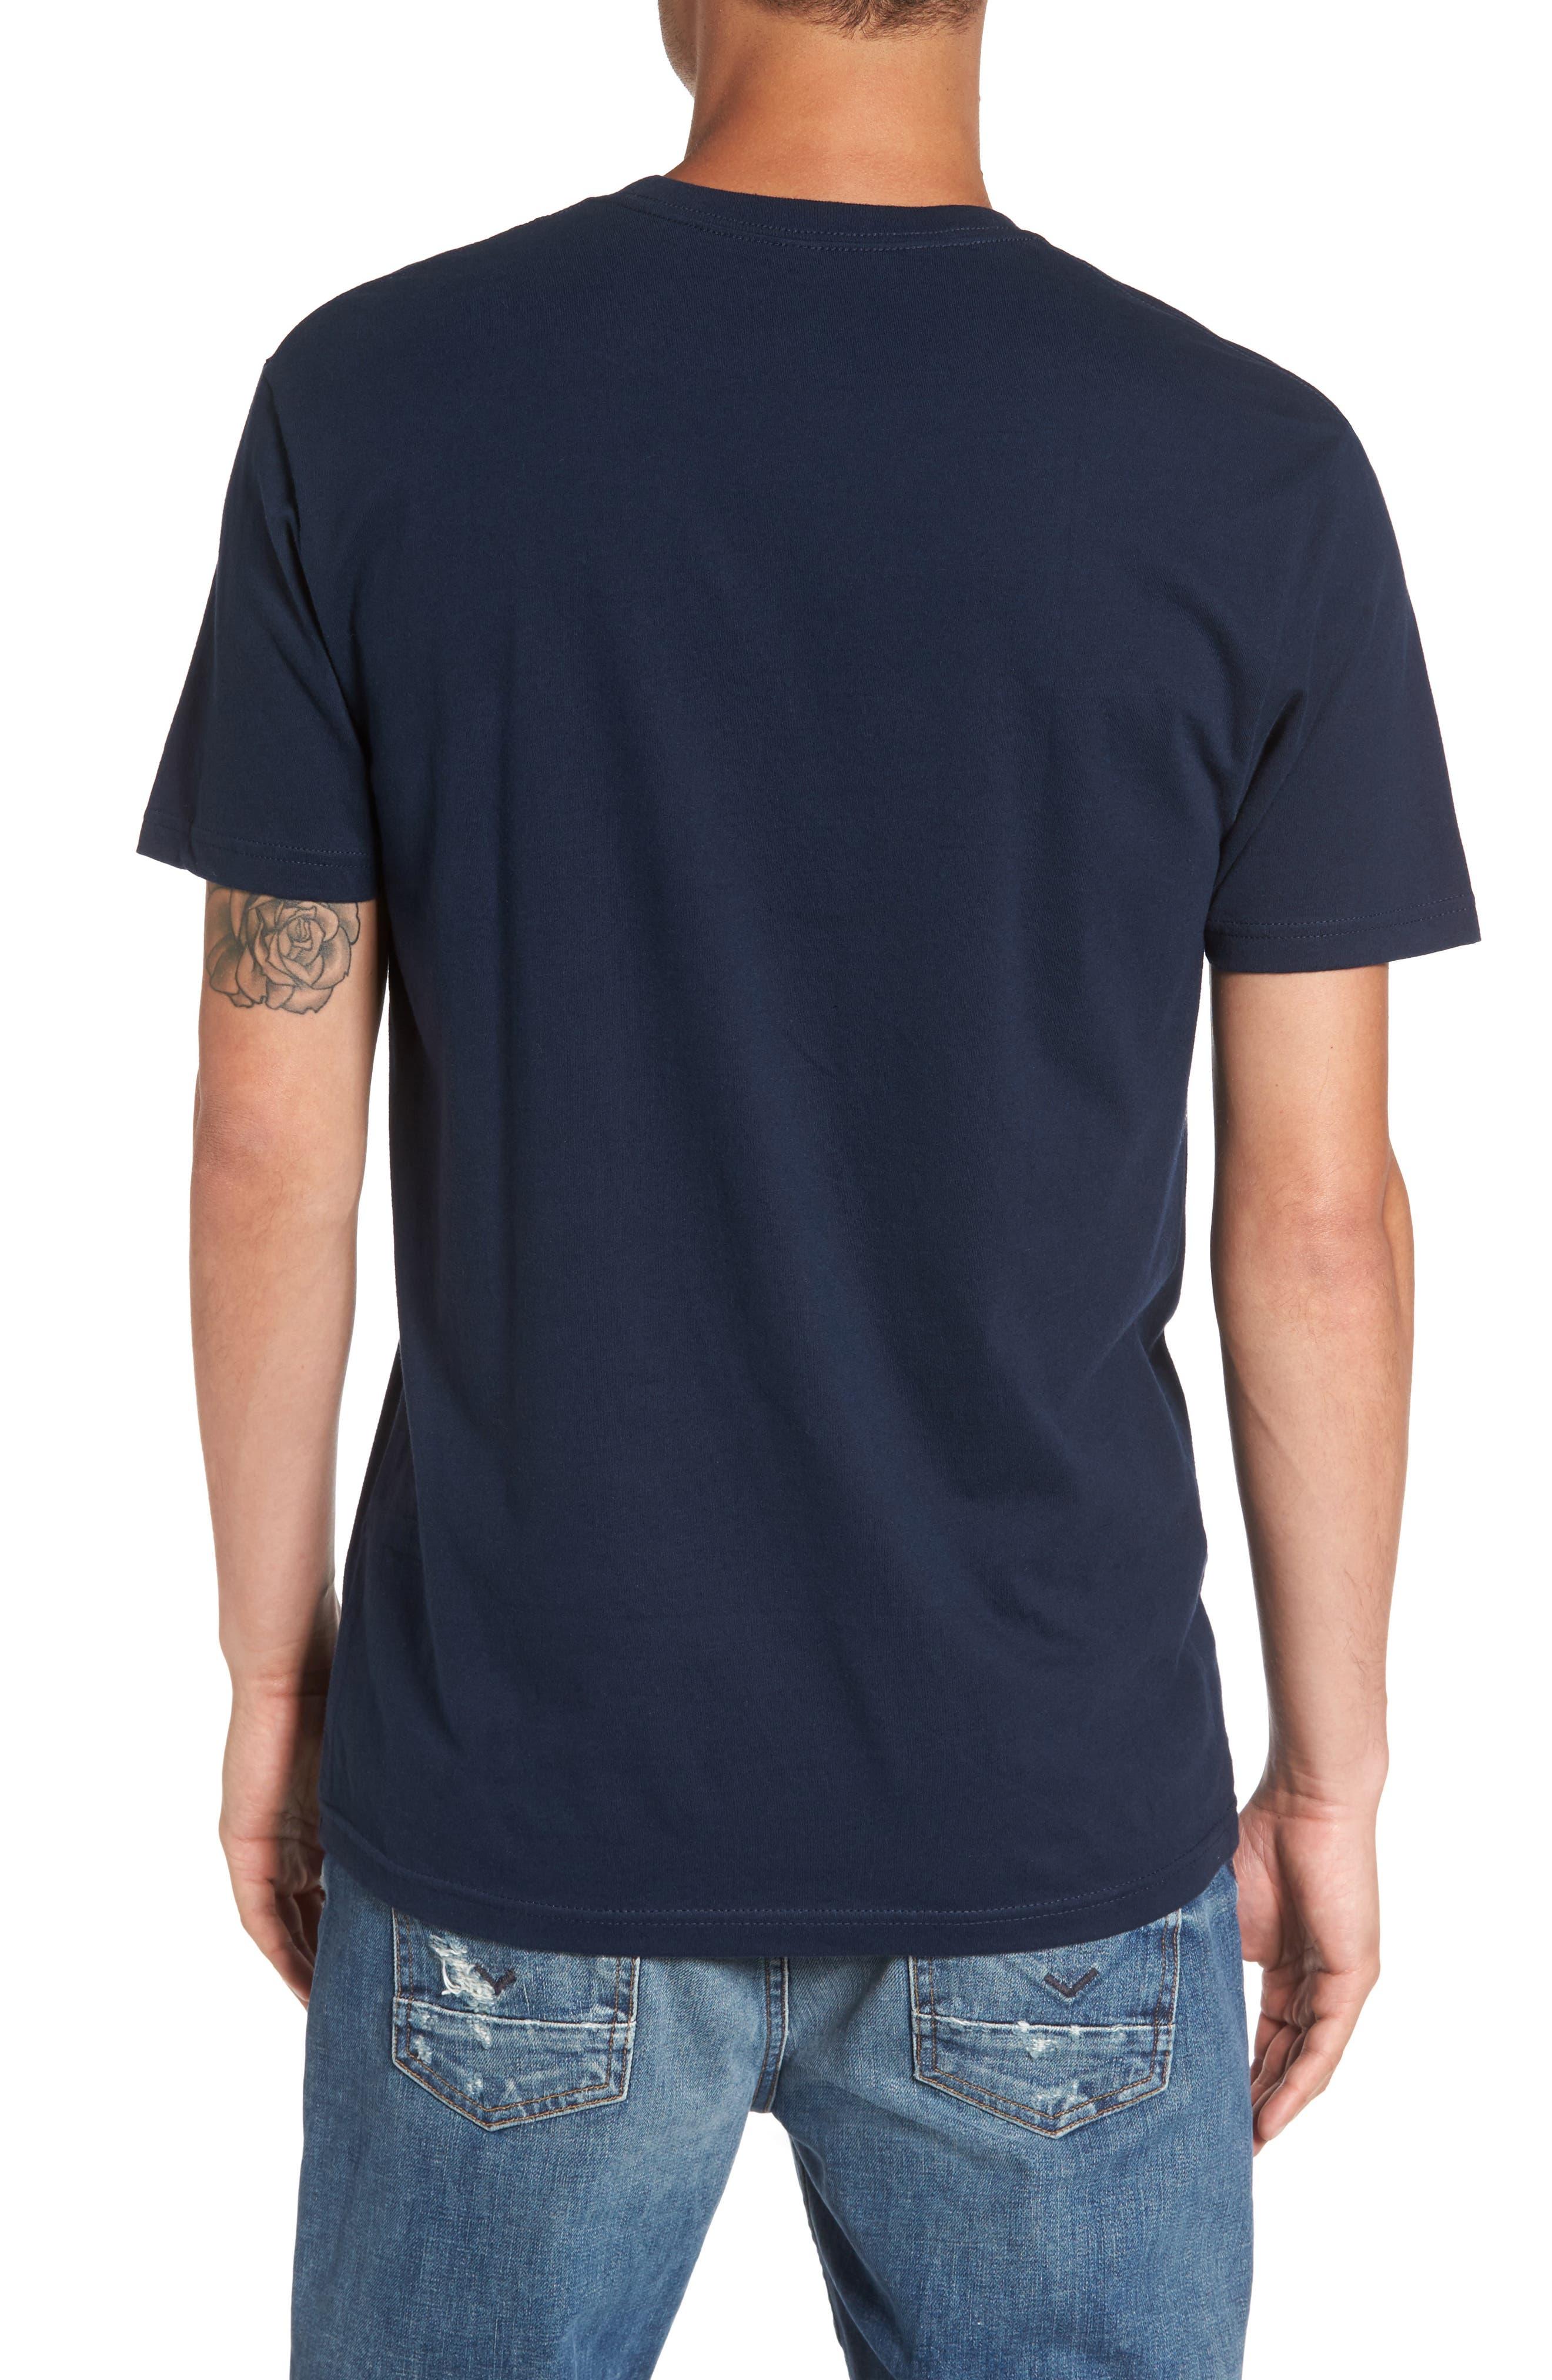 Horrible Idea T-Shirt,                             Alternate thumbnail 2, color,                             410